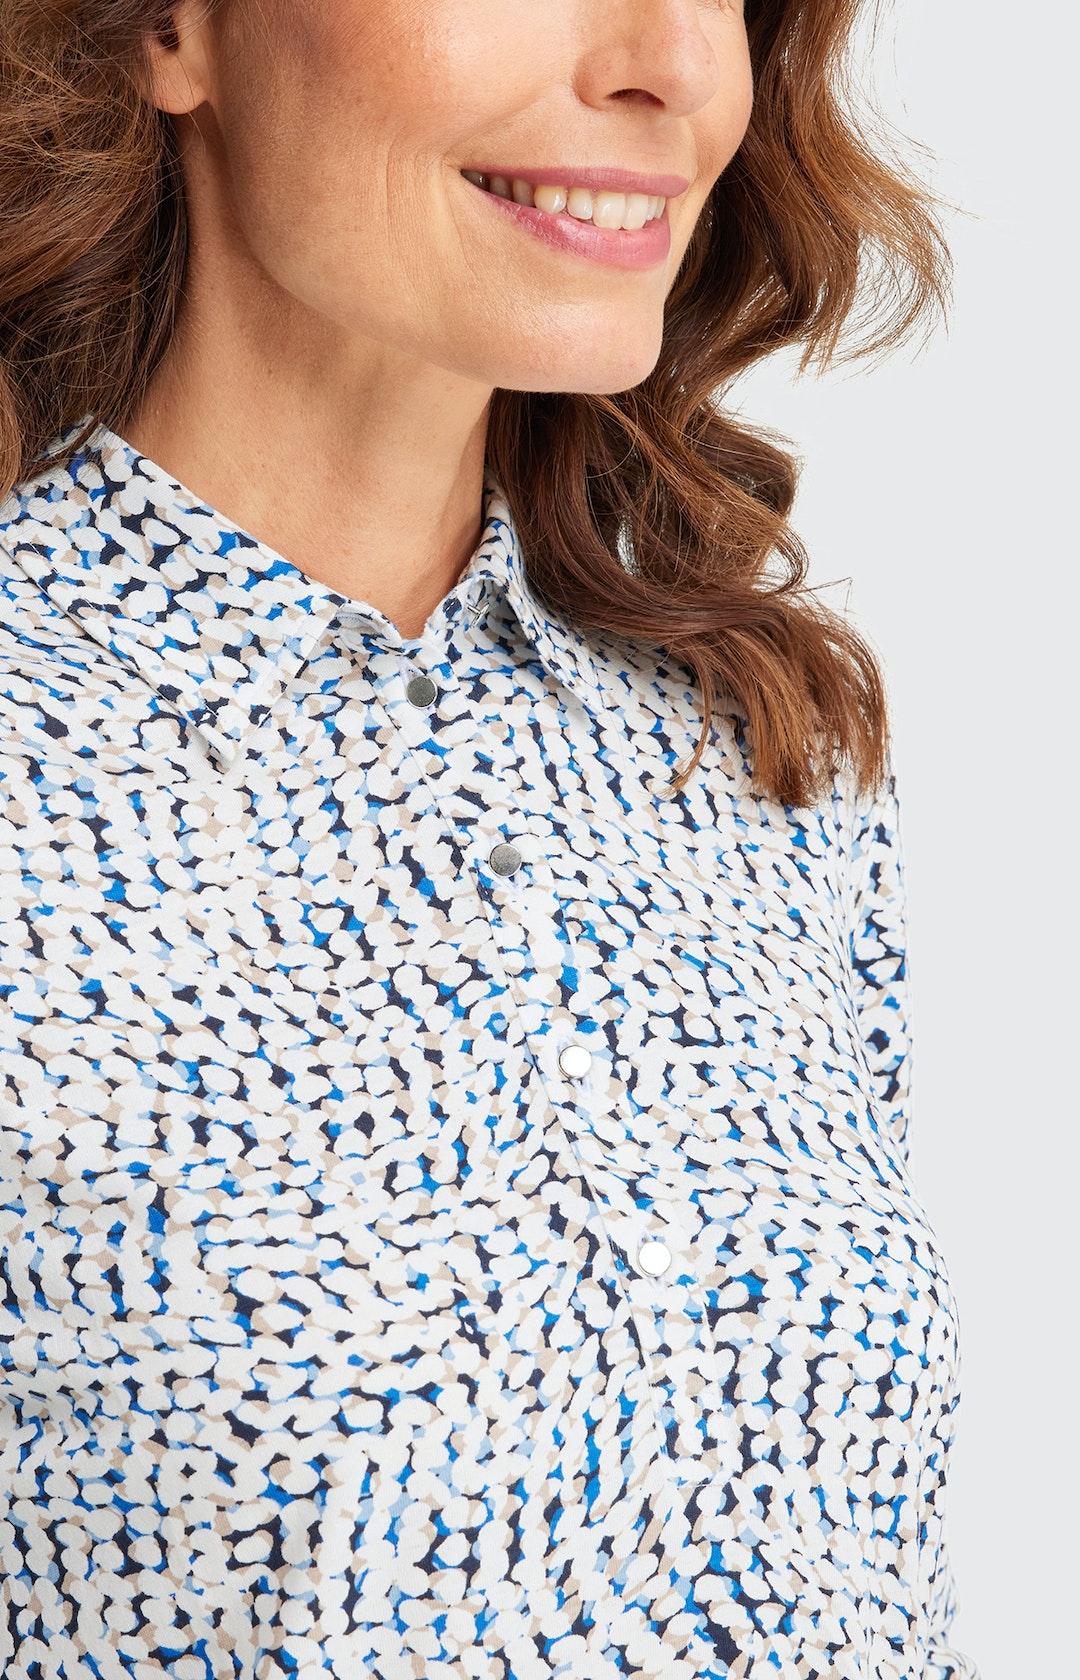 Poloshirt mit Allover-Muster in Weiß